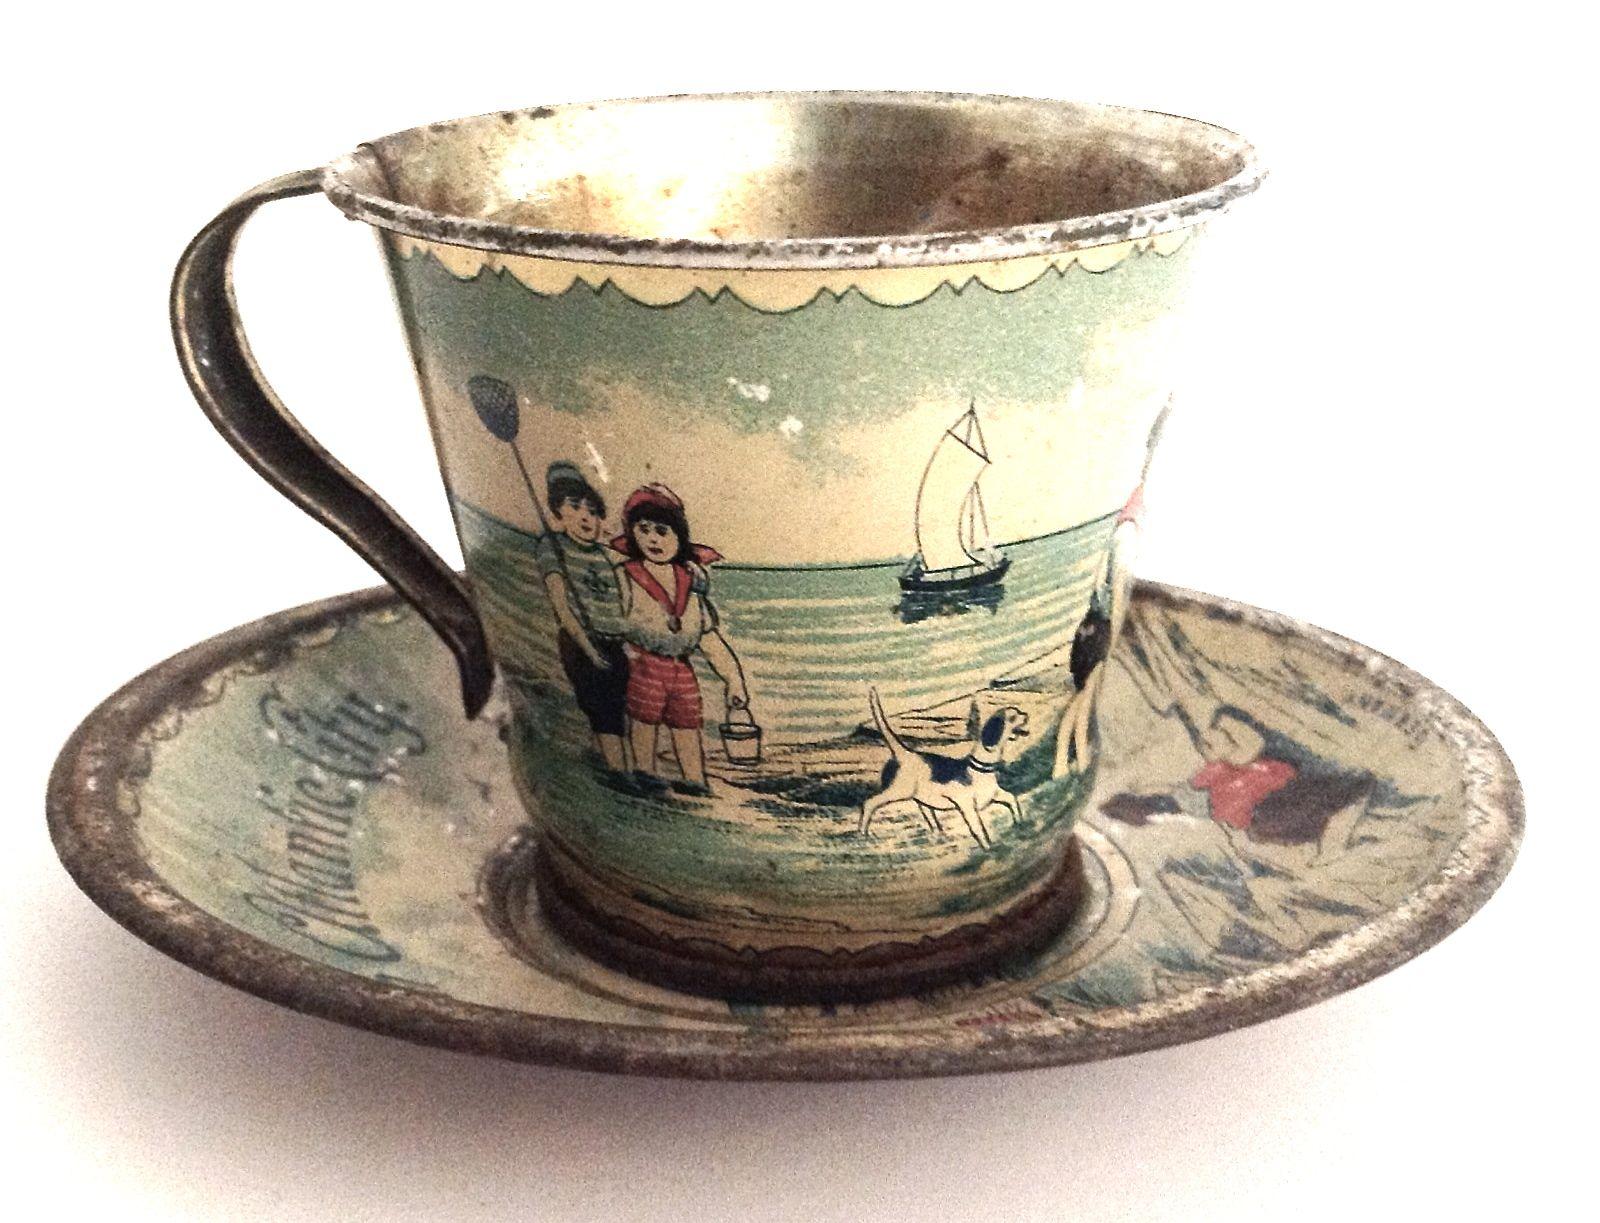 Electronics Cars Fashion Collectibles Coupons And More Ebay Tea Cups Souvenir Cups Vintage Souvenir